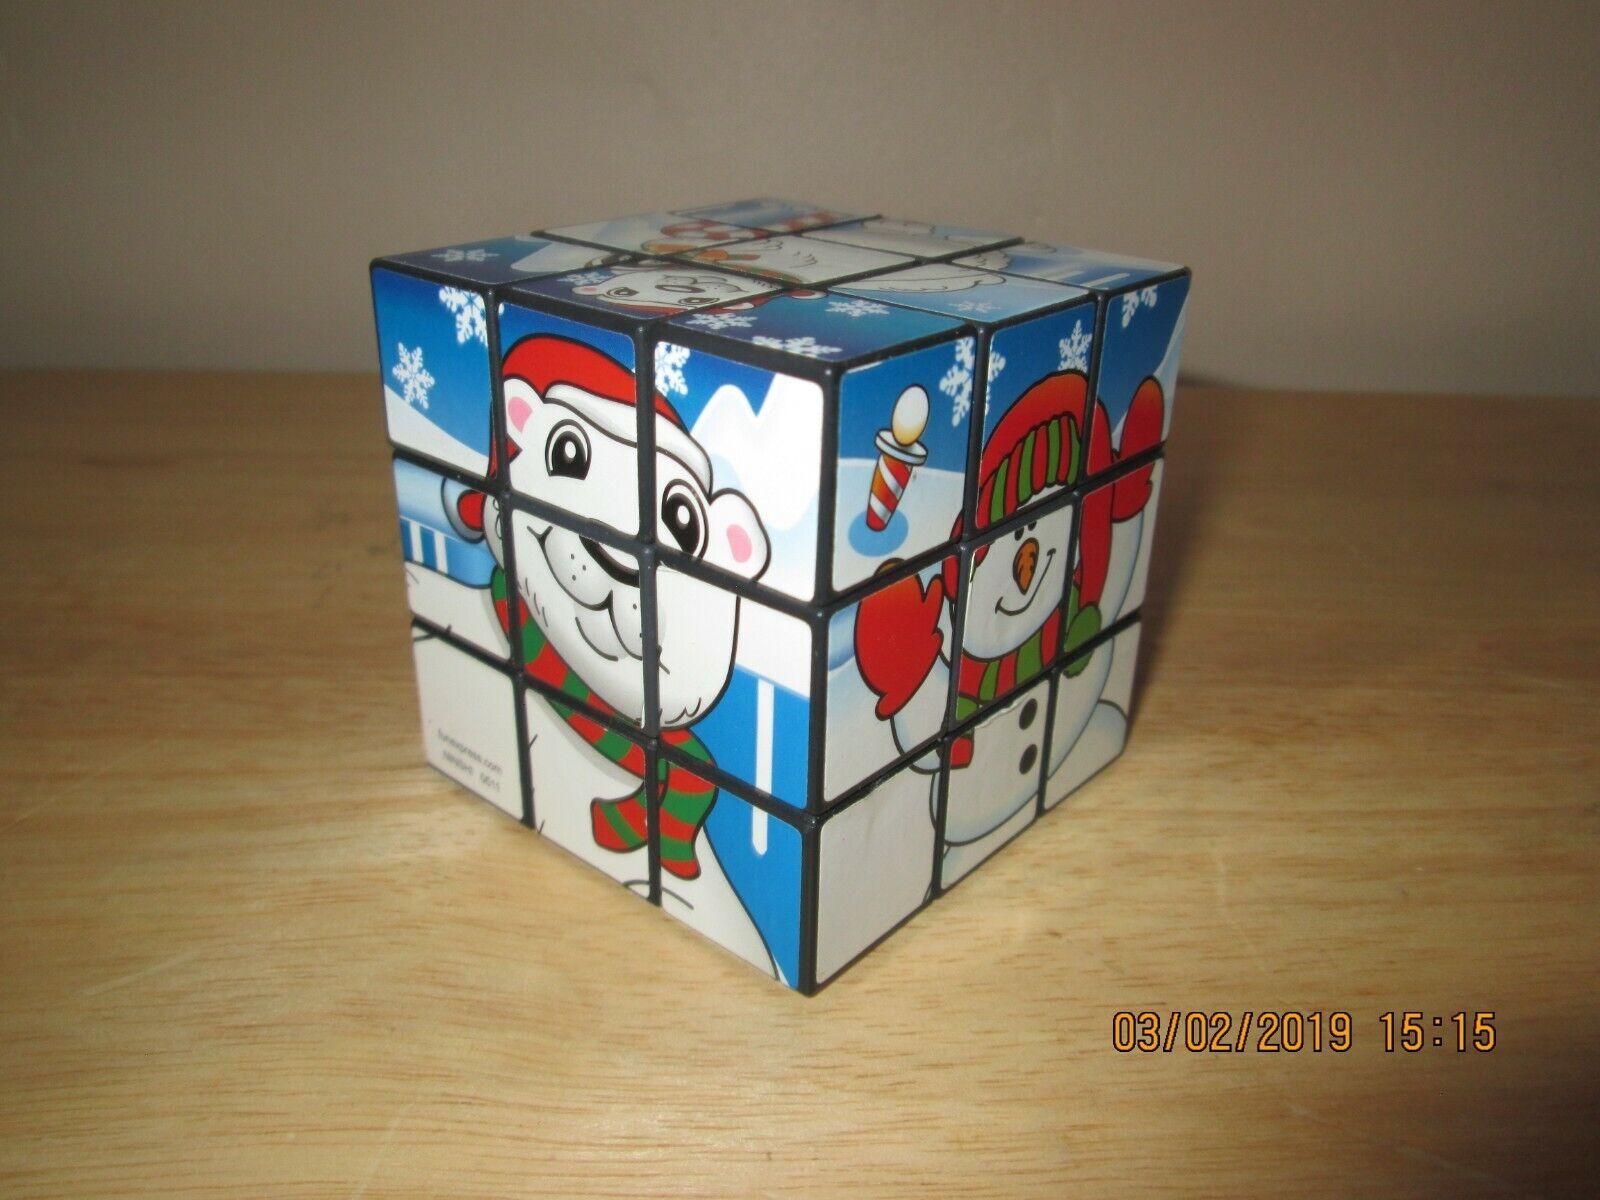 Rubik's Cube 3x3x3 Winter Fun Snow Man Ice Penguin Polar Bear Seal Animal Cold